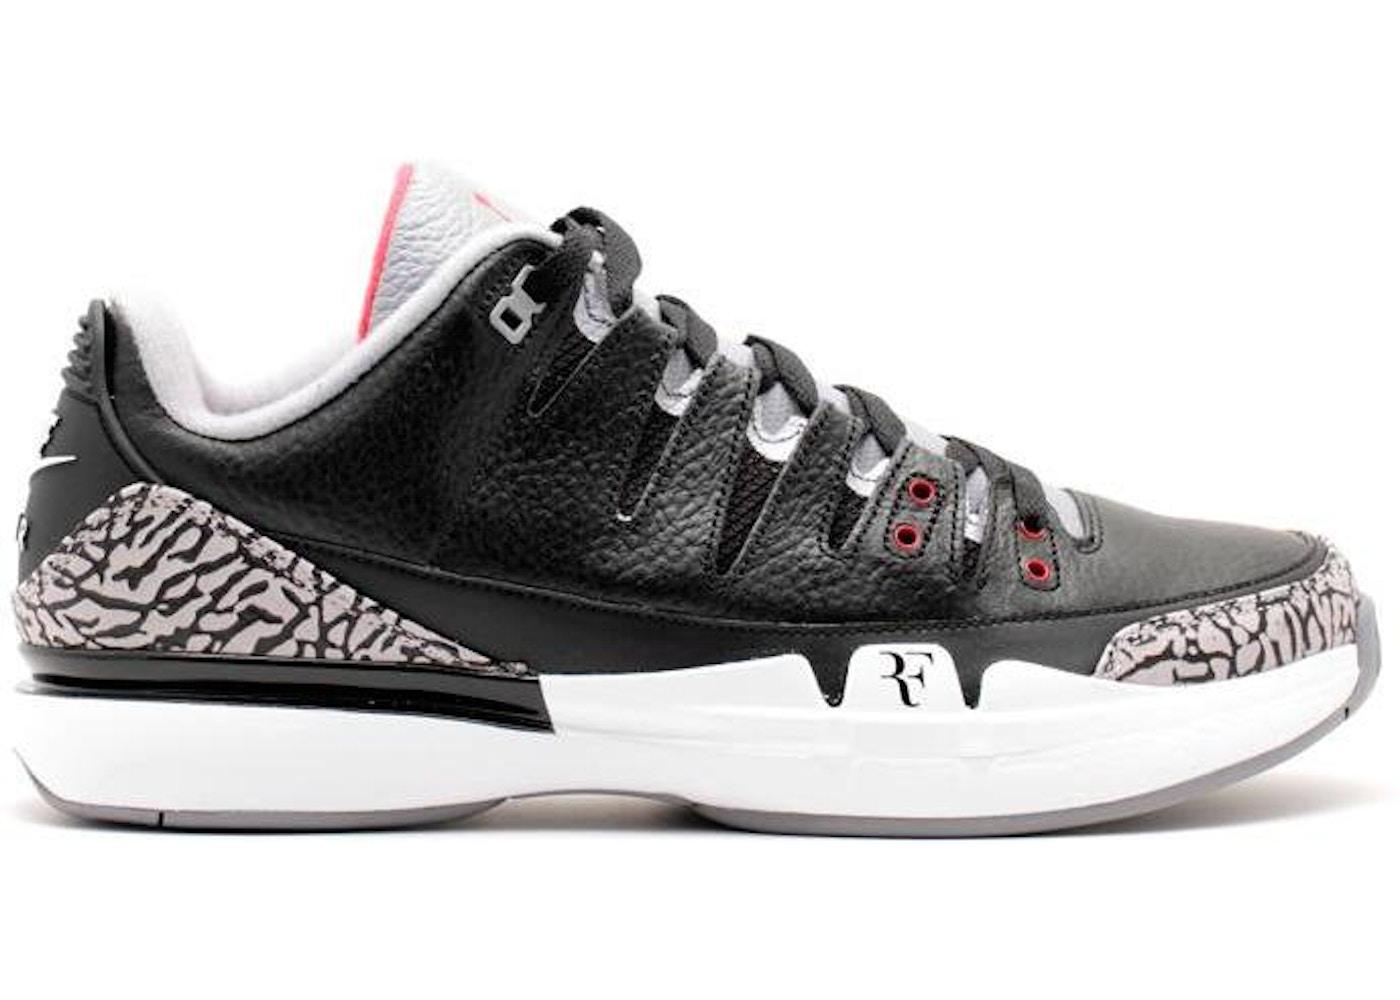 3d9639f2f8c2 Nike Zoom Vapor AJ3 Black Cement - 709998-010